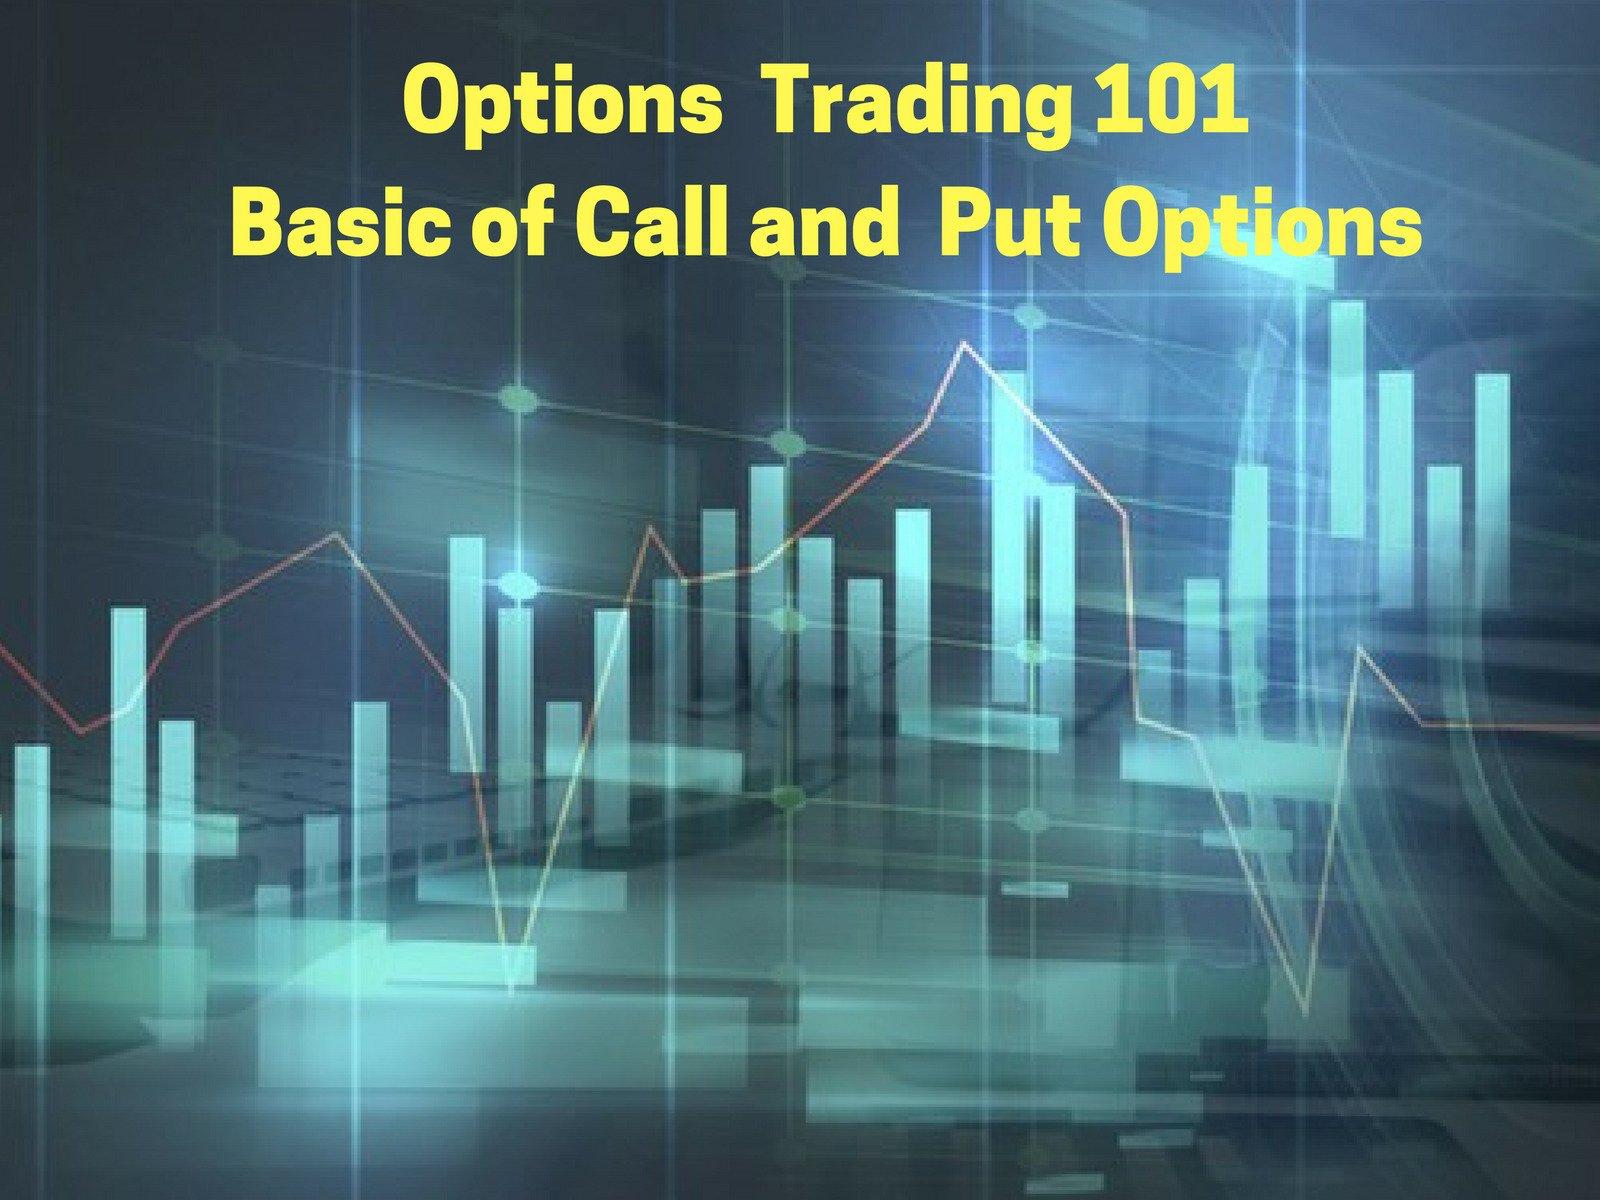 Options Trading 101 - Season 1